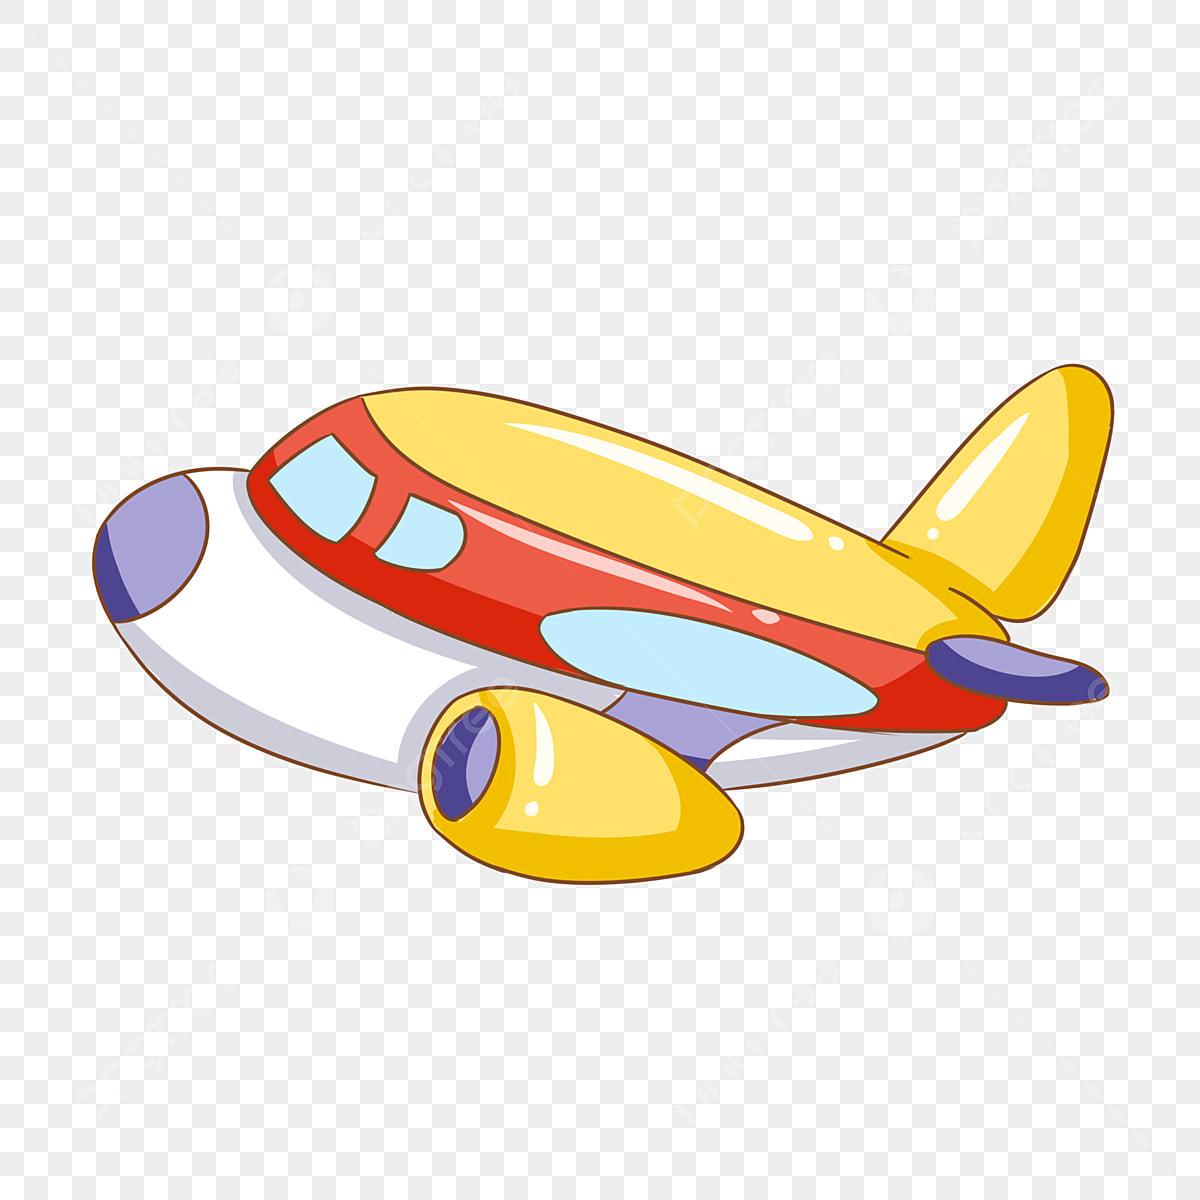 cartoon airplane silhouette png